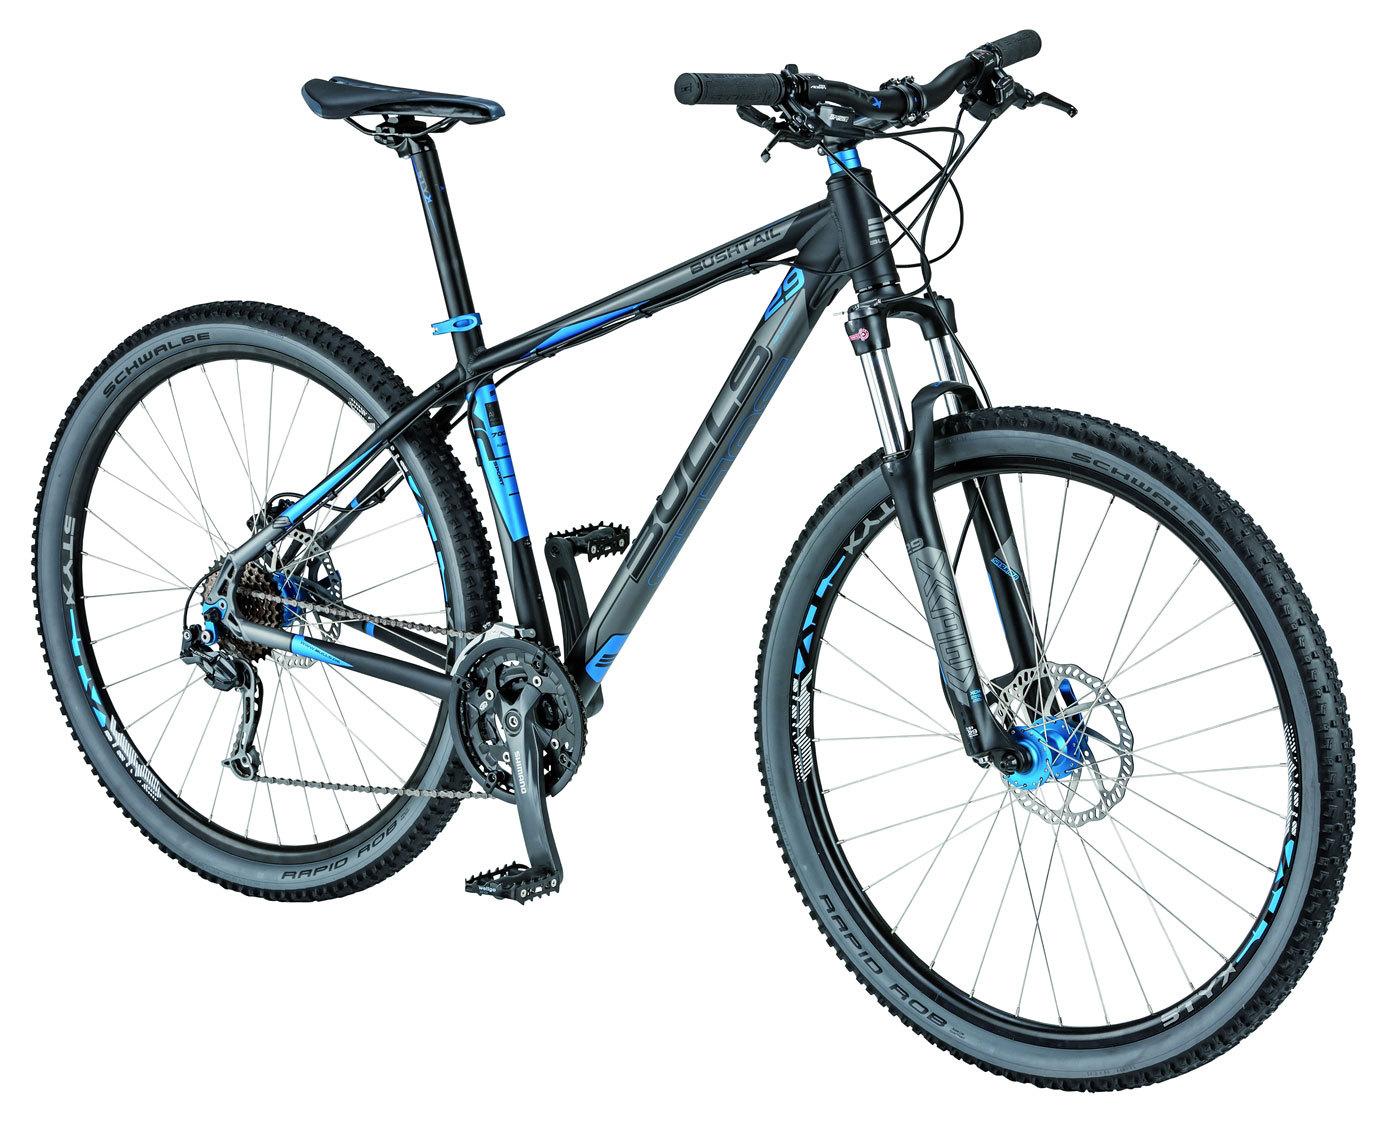 mountainbike bulls bushtail 29 zoll shimano deore 27 g fahrrad 41 cm schwarz ebay. Black Bedroom Furniture Sets. Home Design Ideas